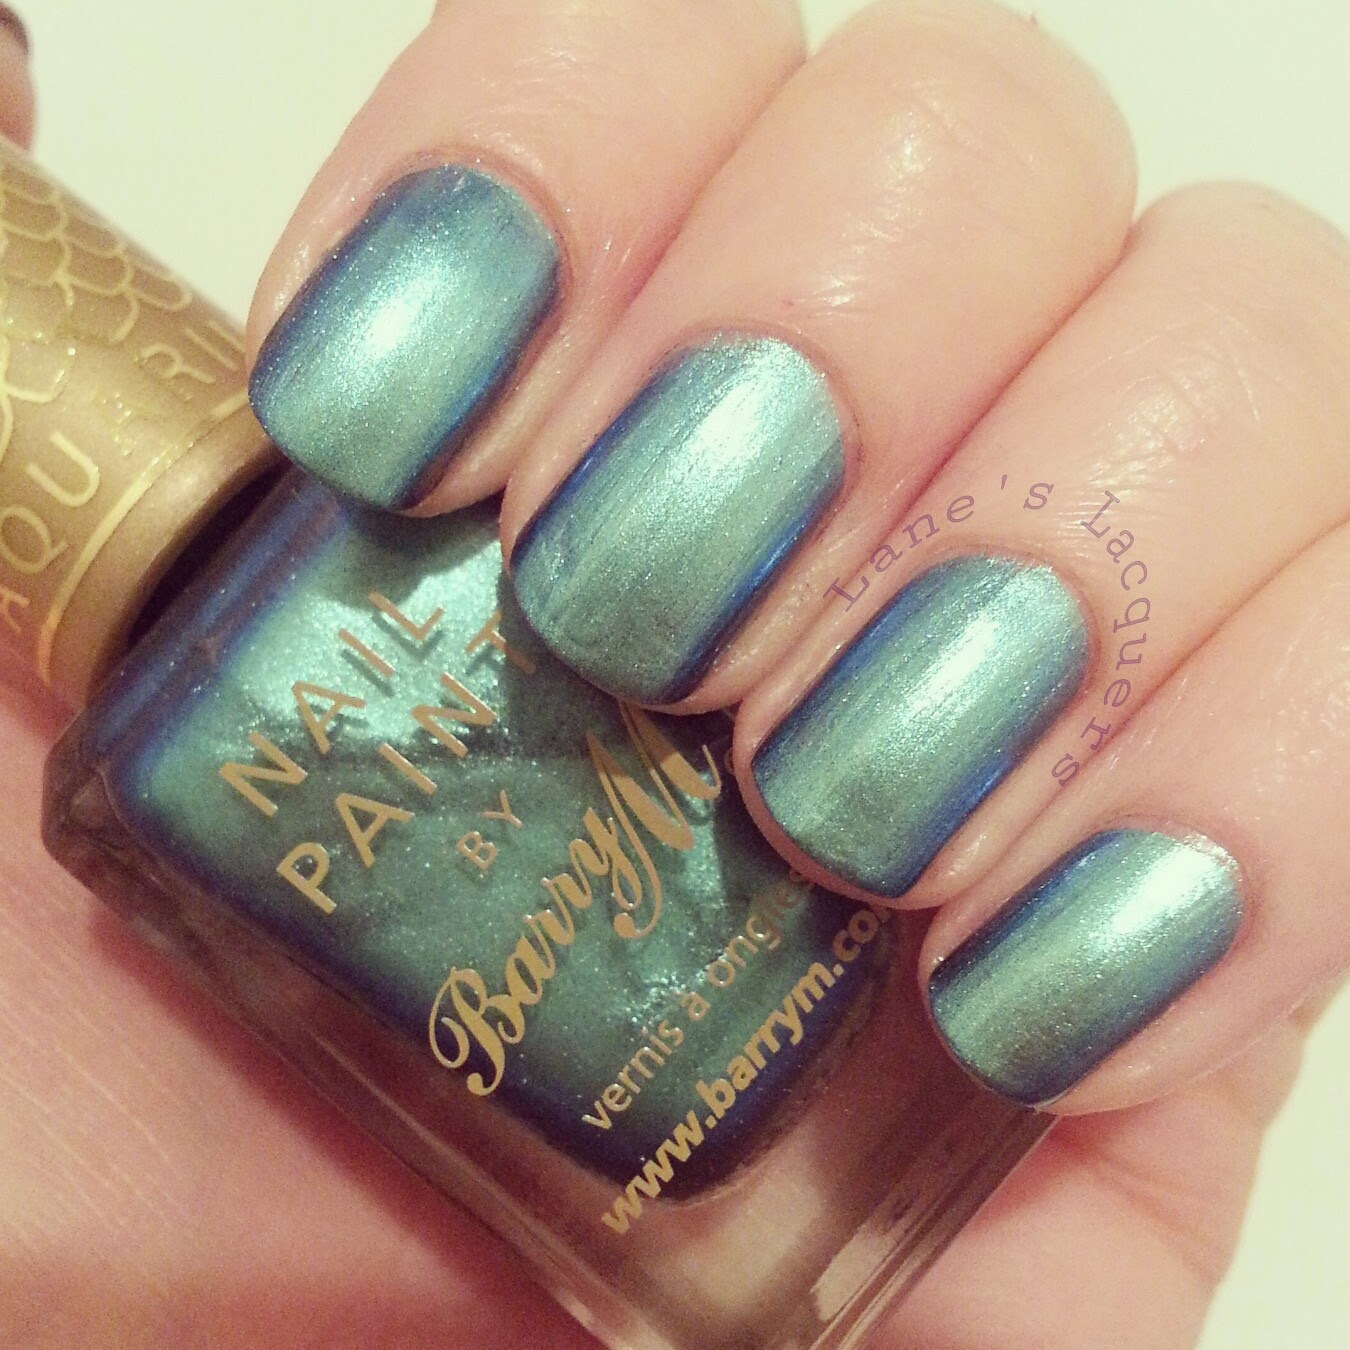 barry-m-aquarium-blue-aqnp6-swatch-nails